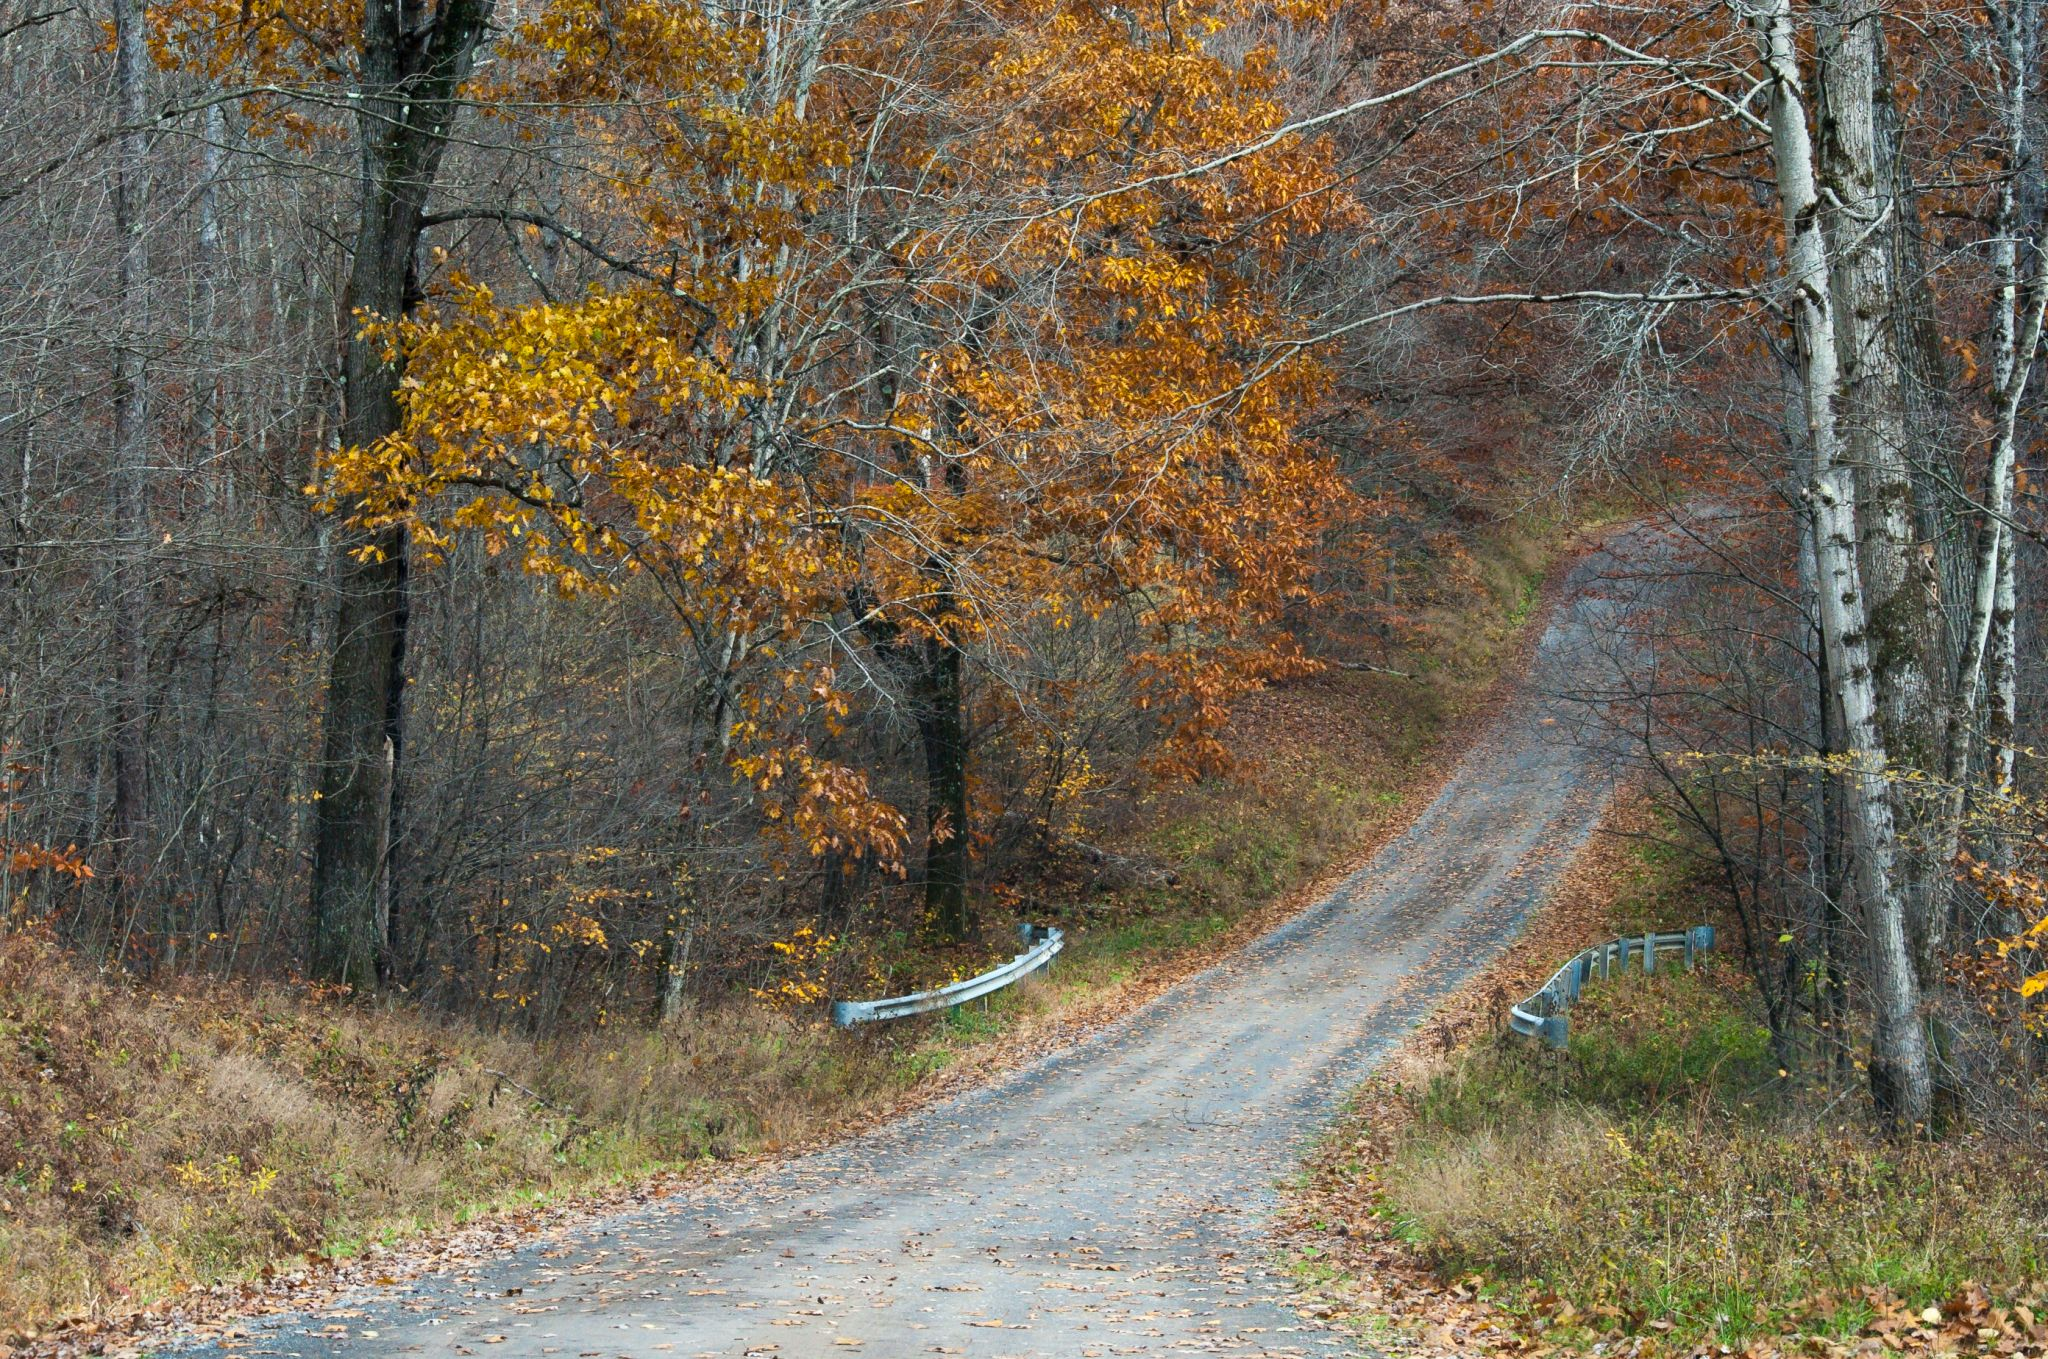 Millstone Road, USA